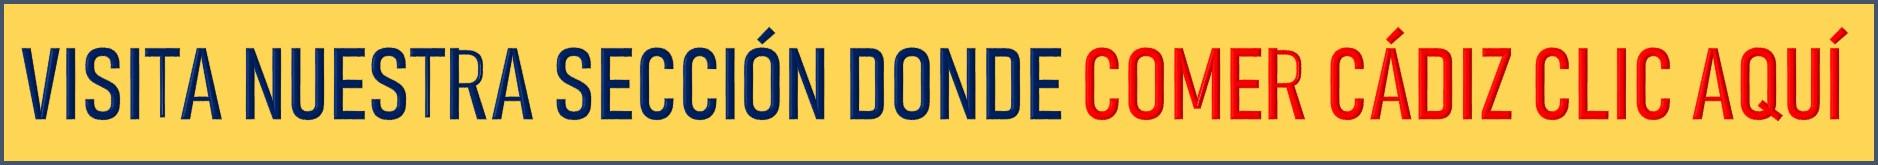 DONDE COMER CADIZ 0